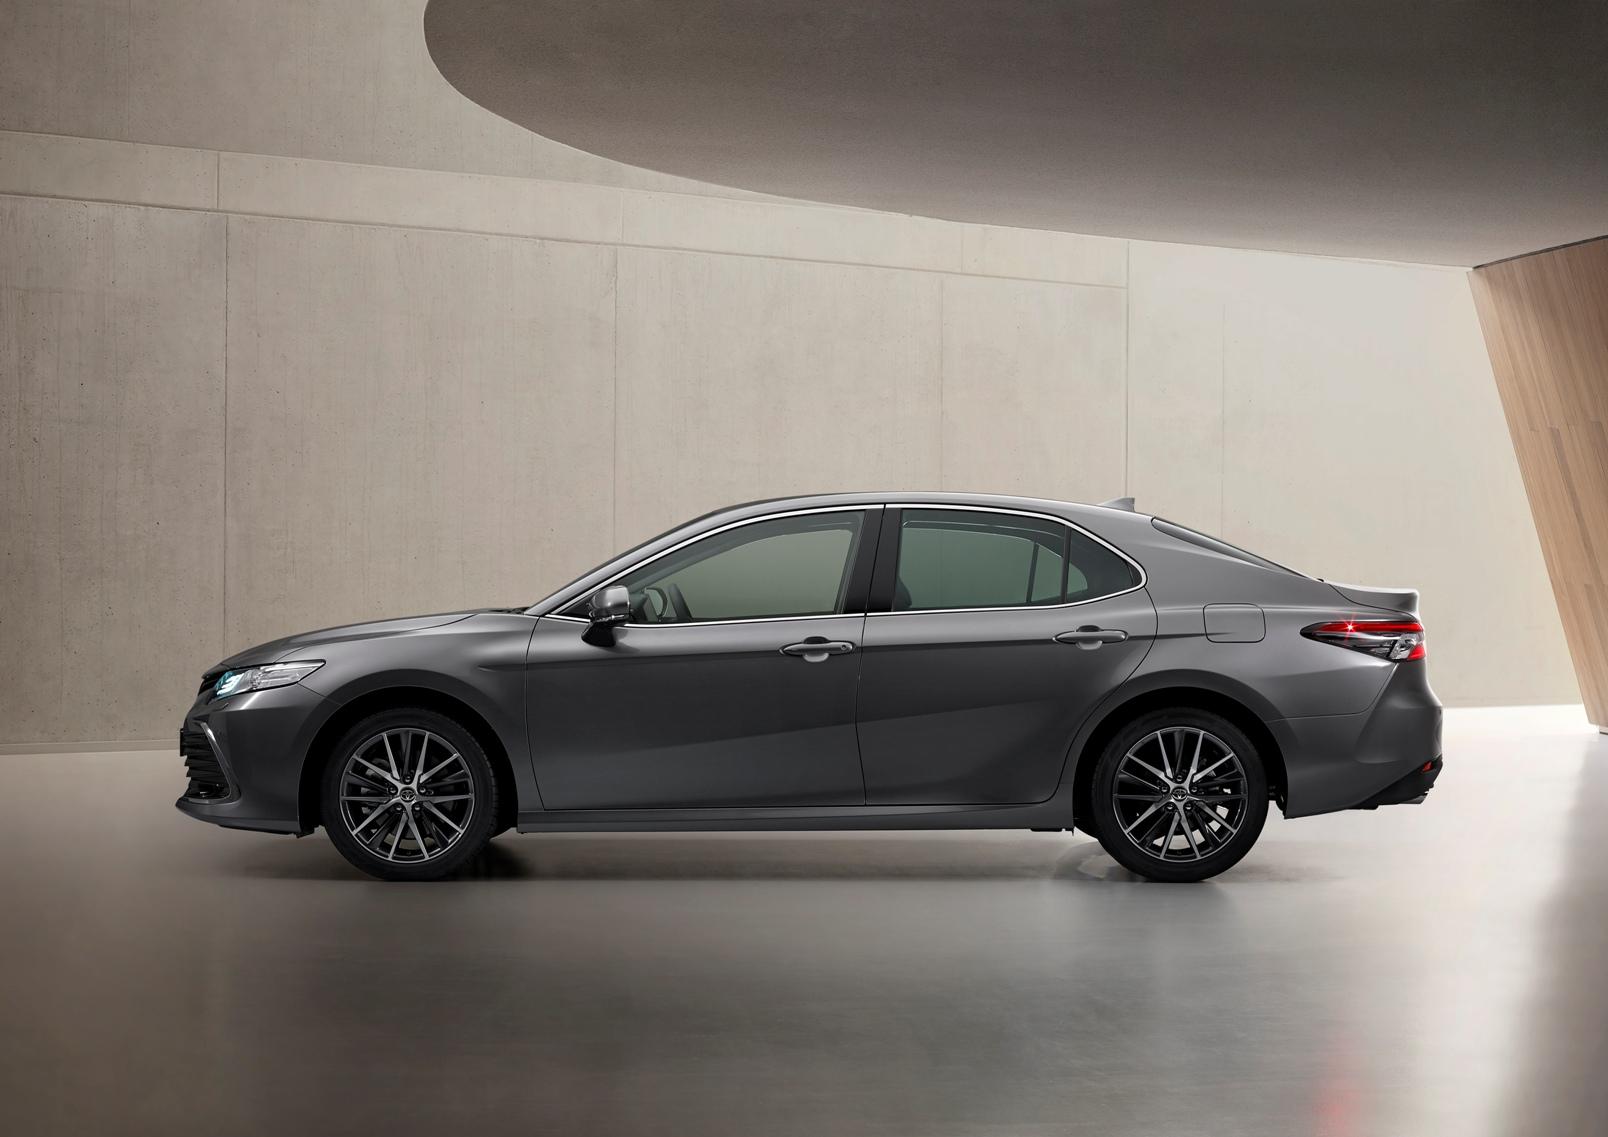 Toyota Camry Electric Hybrid 2021 (5)